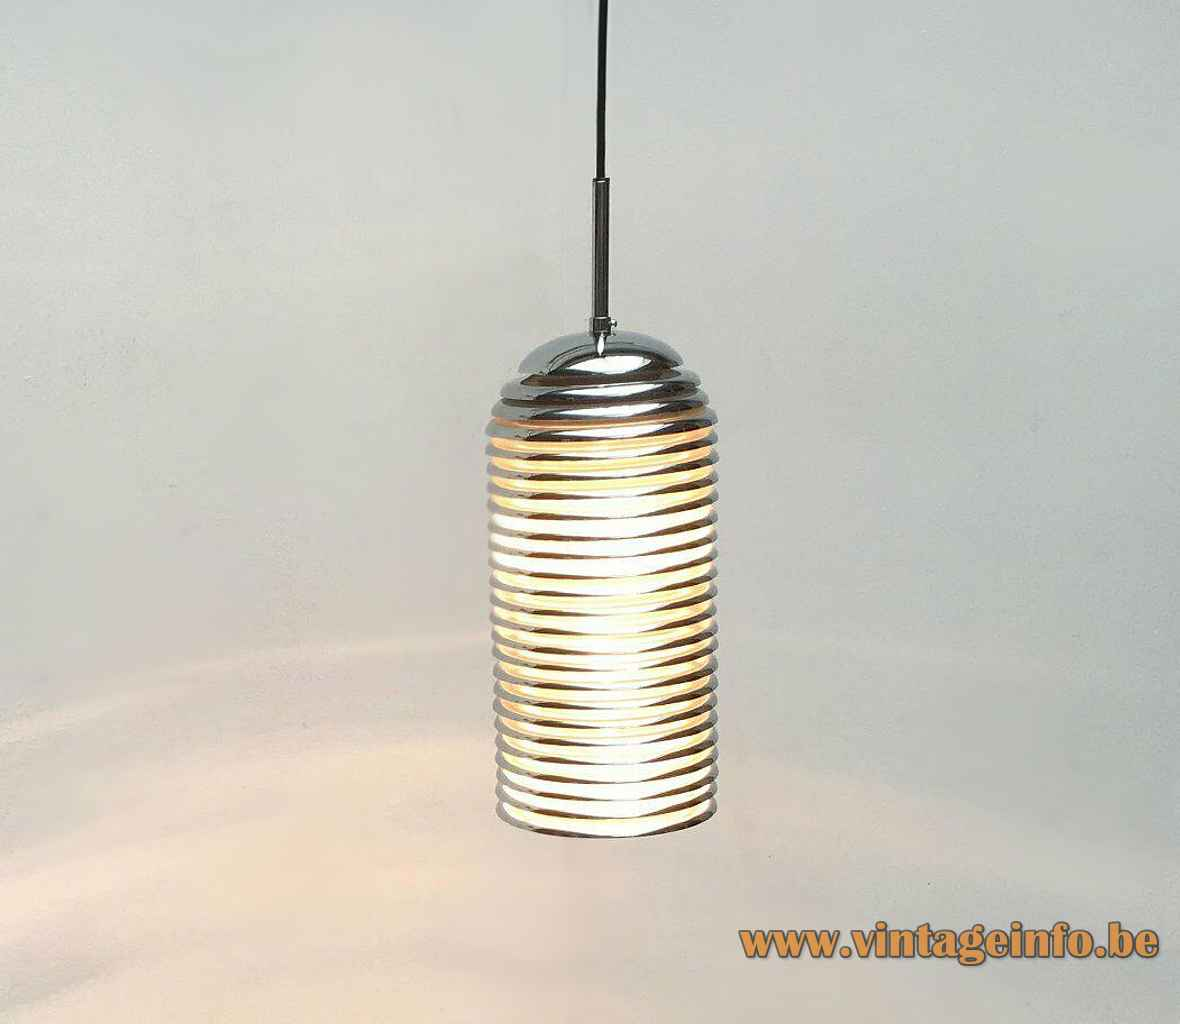 Kazuo Motozawa Saturno pendant lamp stacked chrome rings lampshade 1970 design Yamagiwa & Staff Leuchten Germany